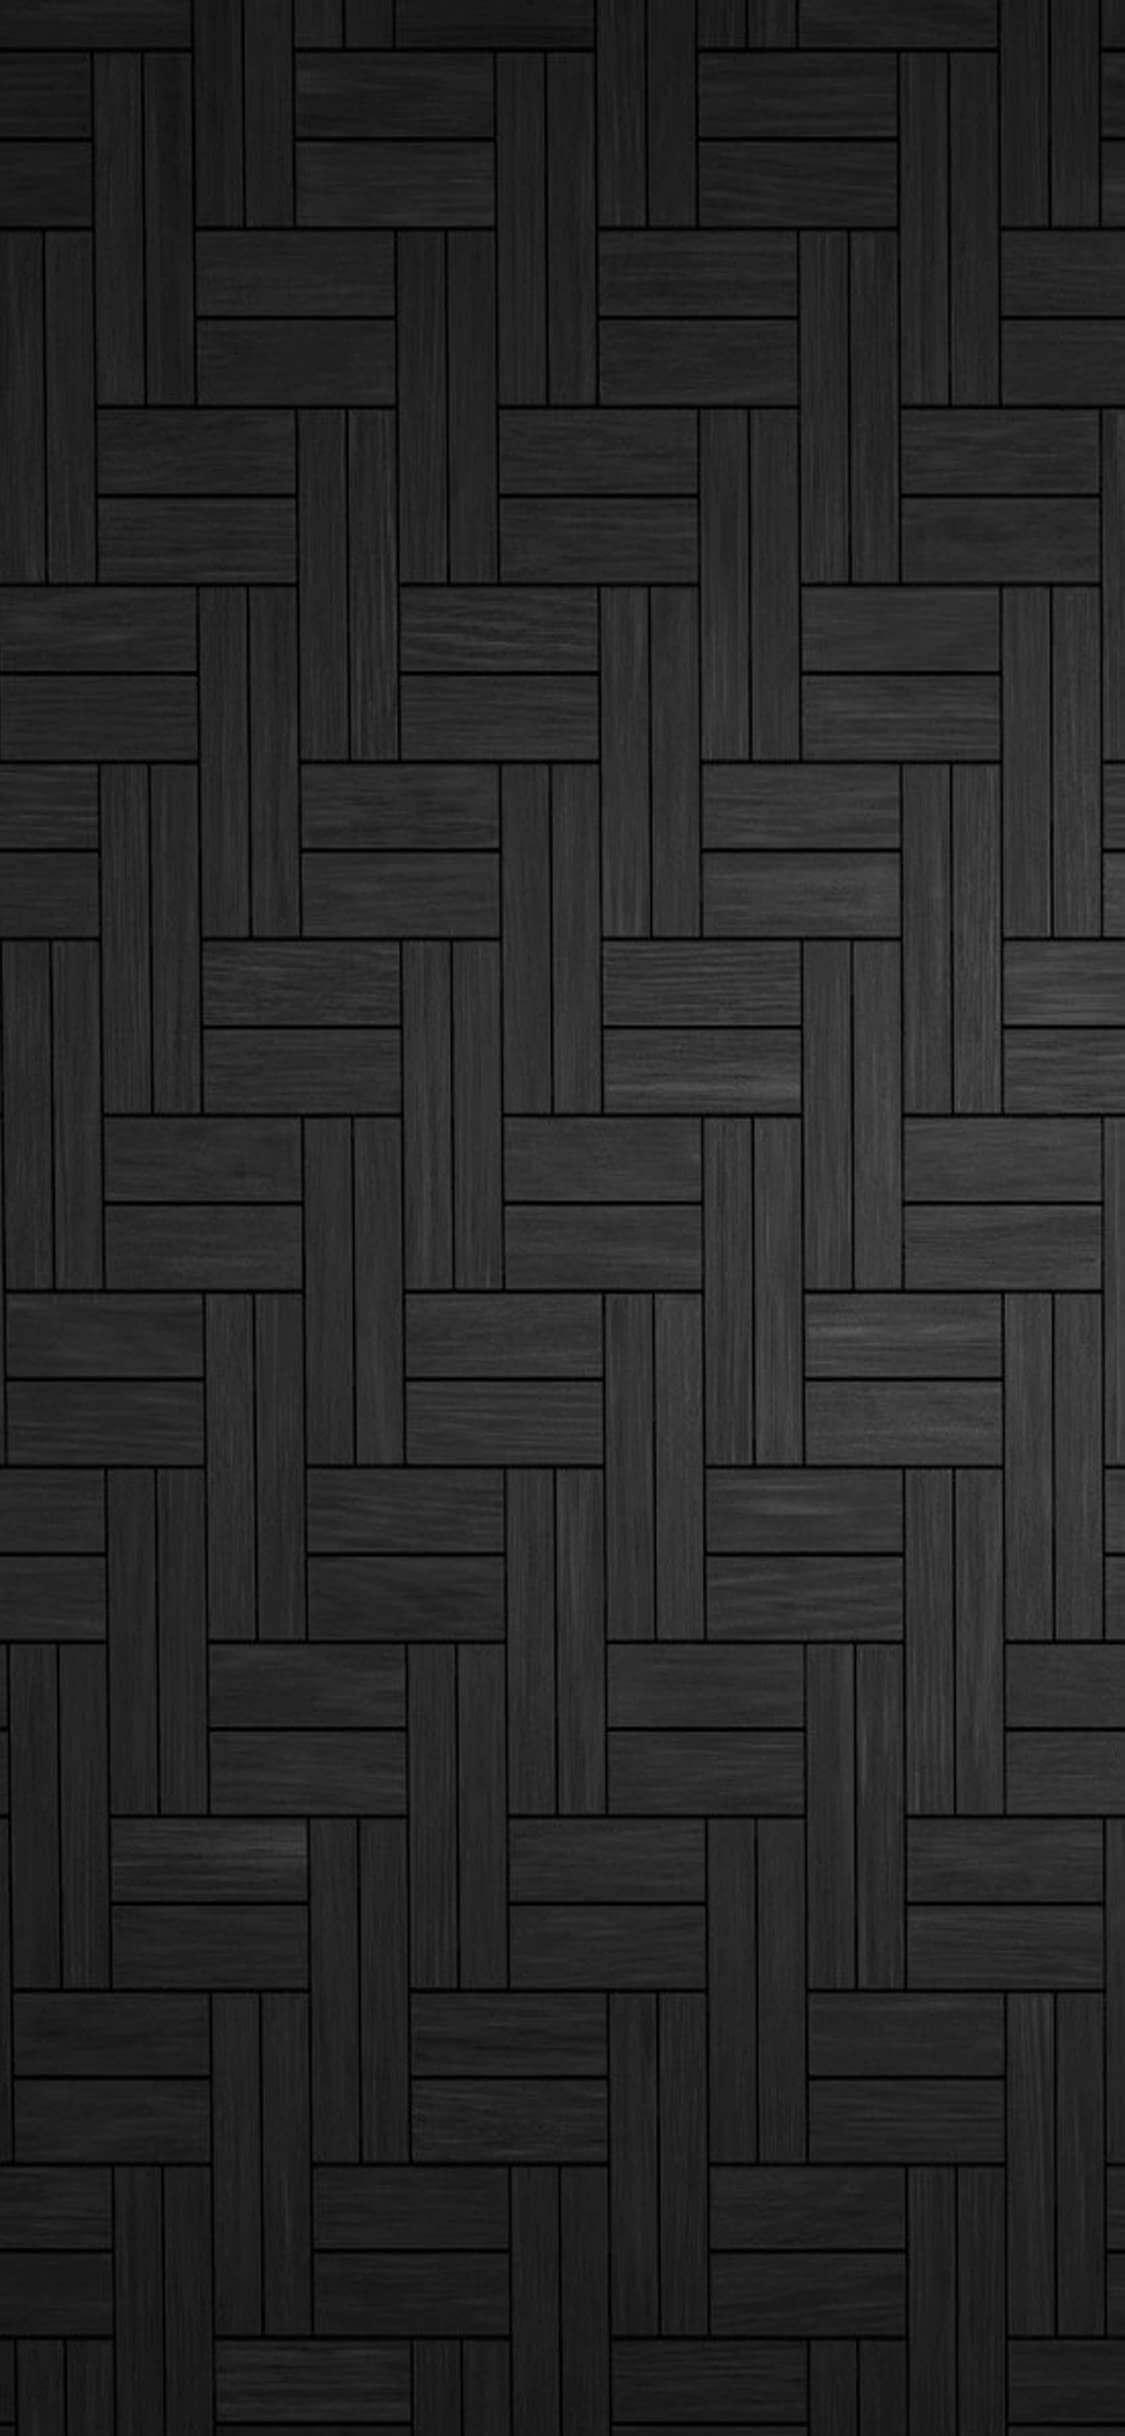 iPhone Mountain background black HD Wallpaper